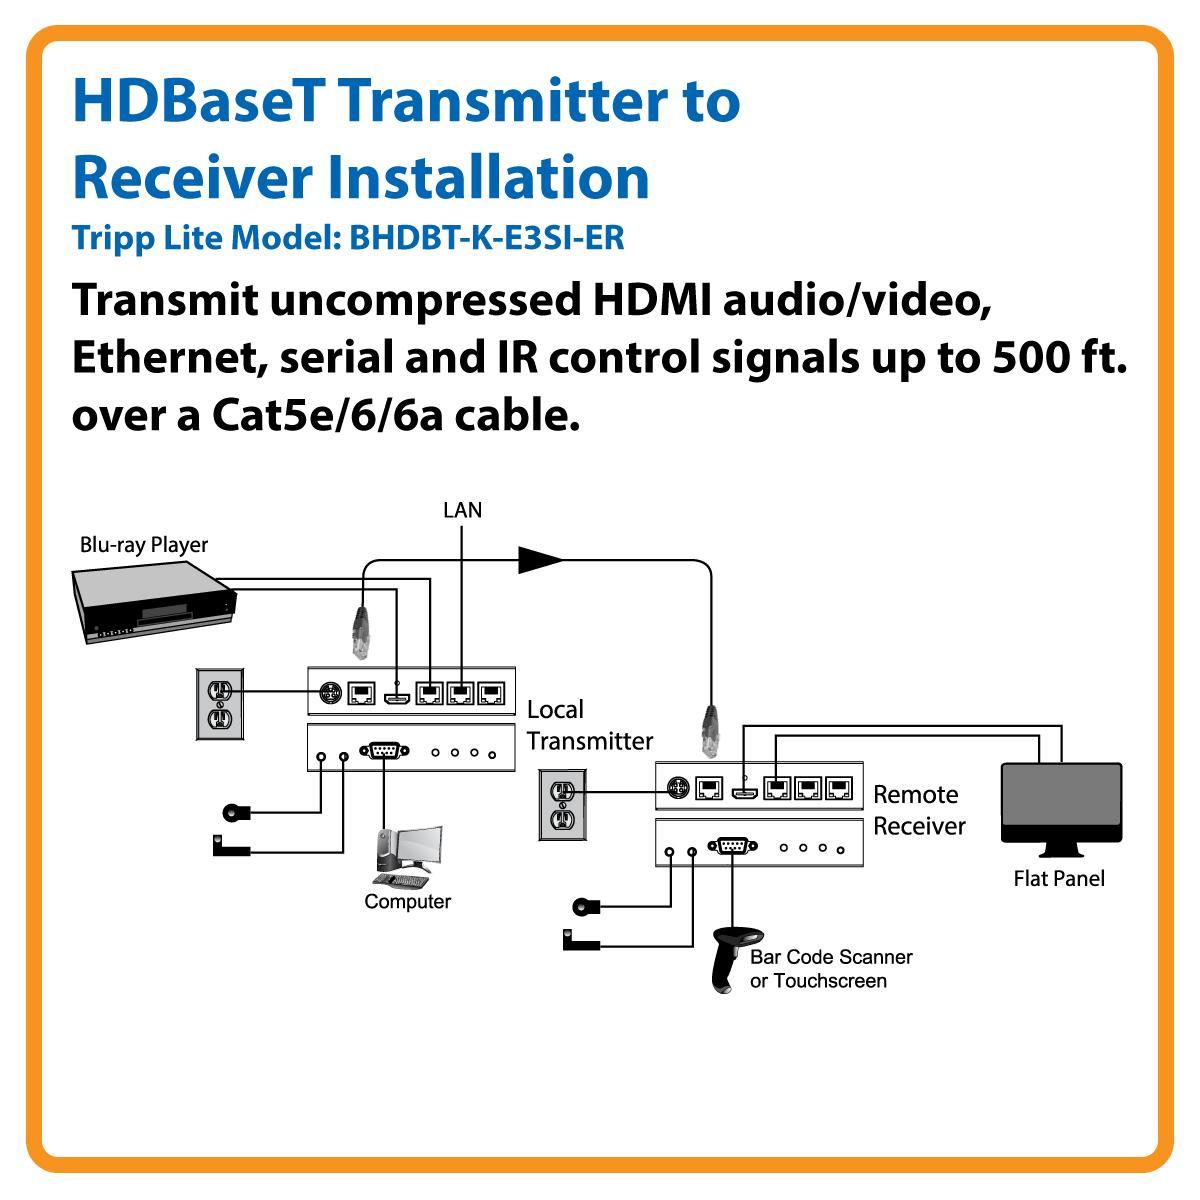 Tripp Lite Hdbaset Hdmi Over Cat5e 6 6a Extender Kit W Litetm Transmitter Ethernet Serial And Ir Control